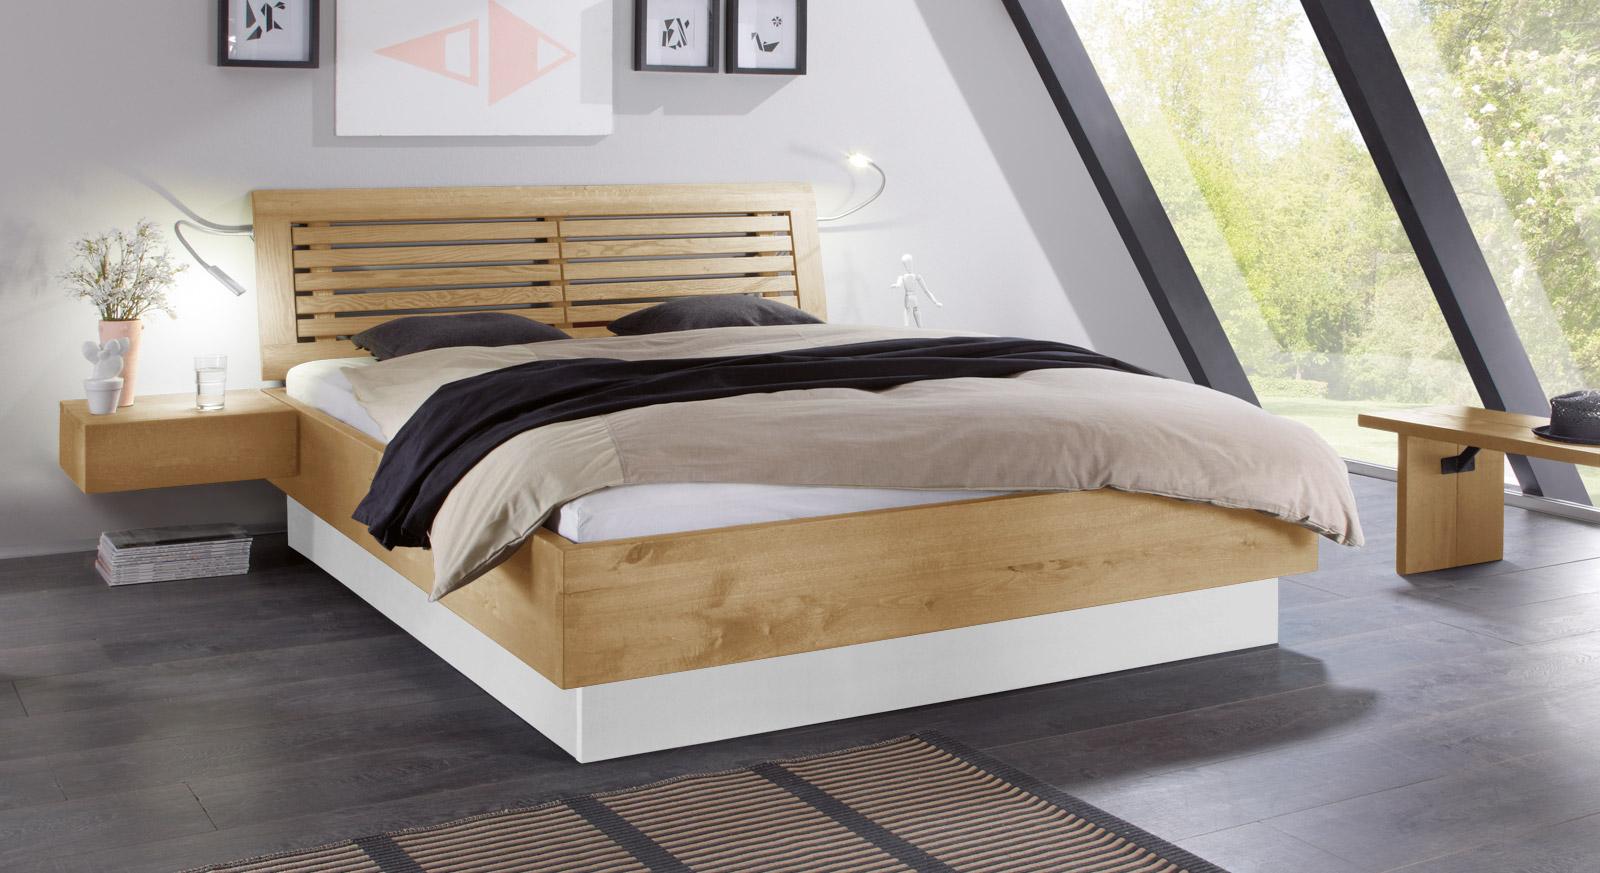 massivholzbett mit bettkasten und lattenrost patea. Black Bedroom Furniture Sets. Home Design Ideas